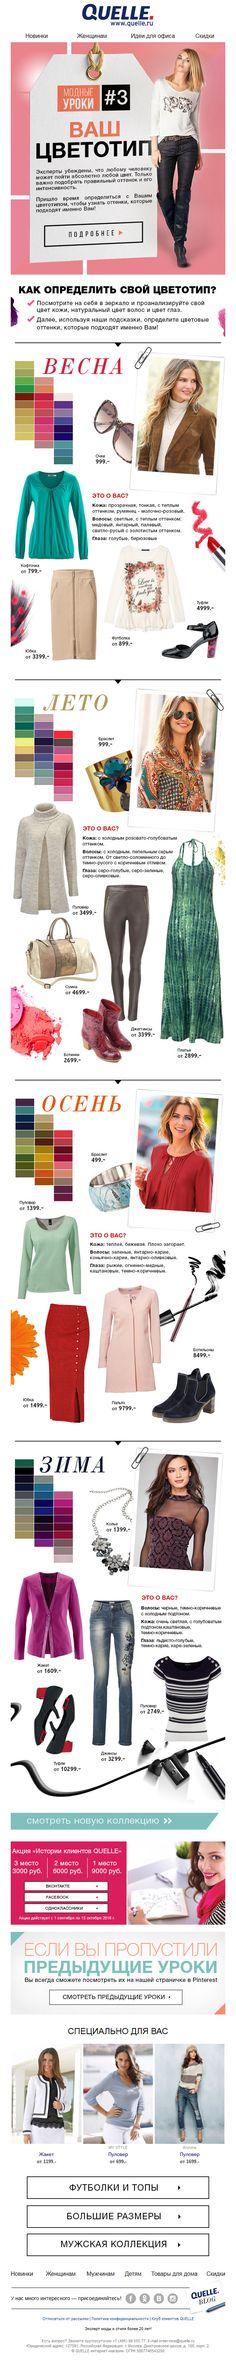 мода, уроки моды, стиль, гардероб, цветотип, весна, лето, зима, осень, оттенки